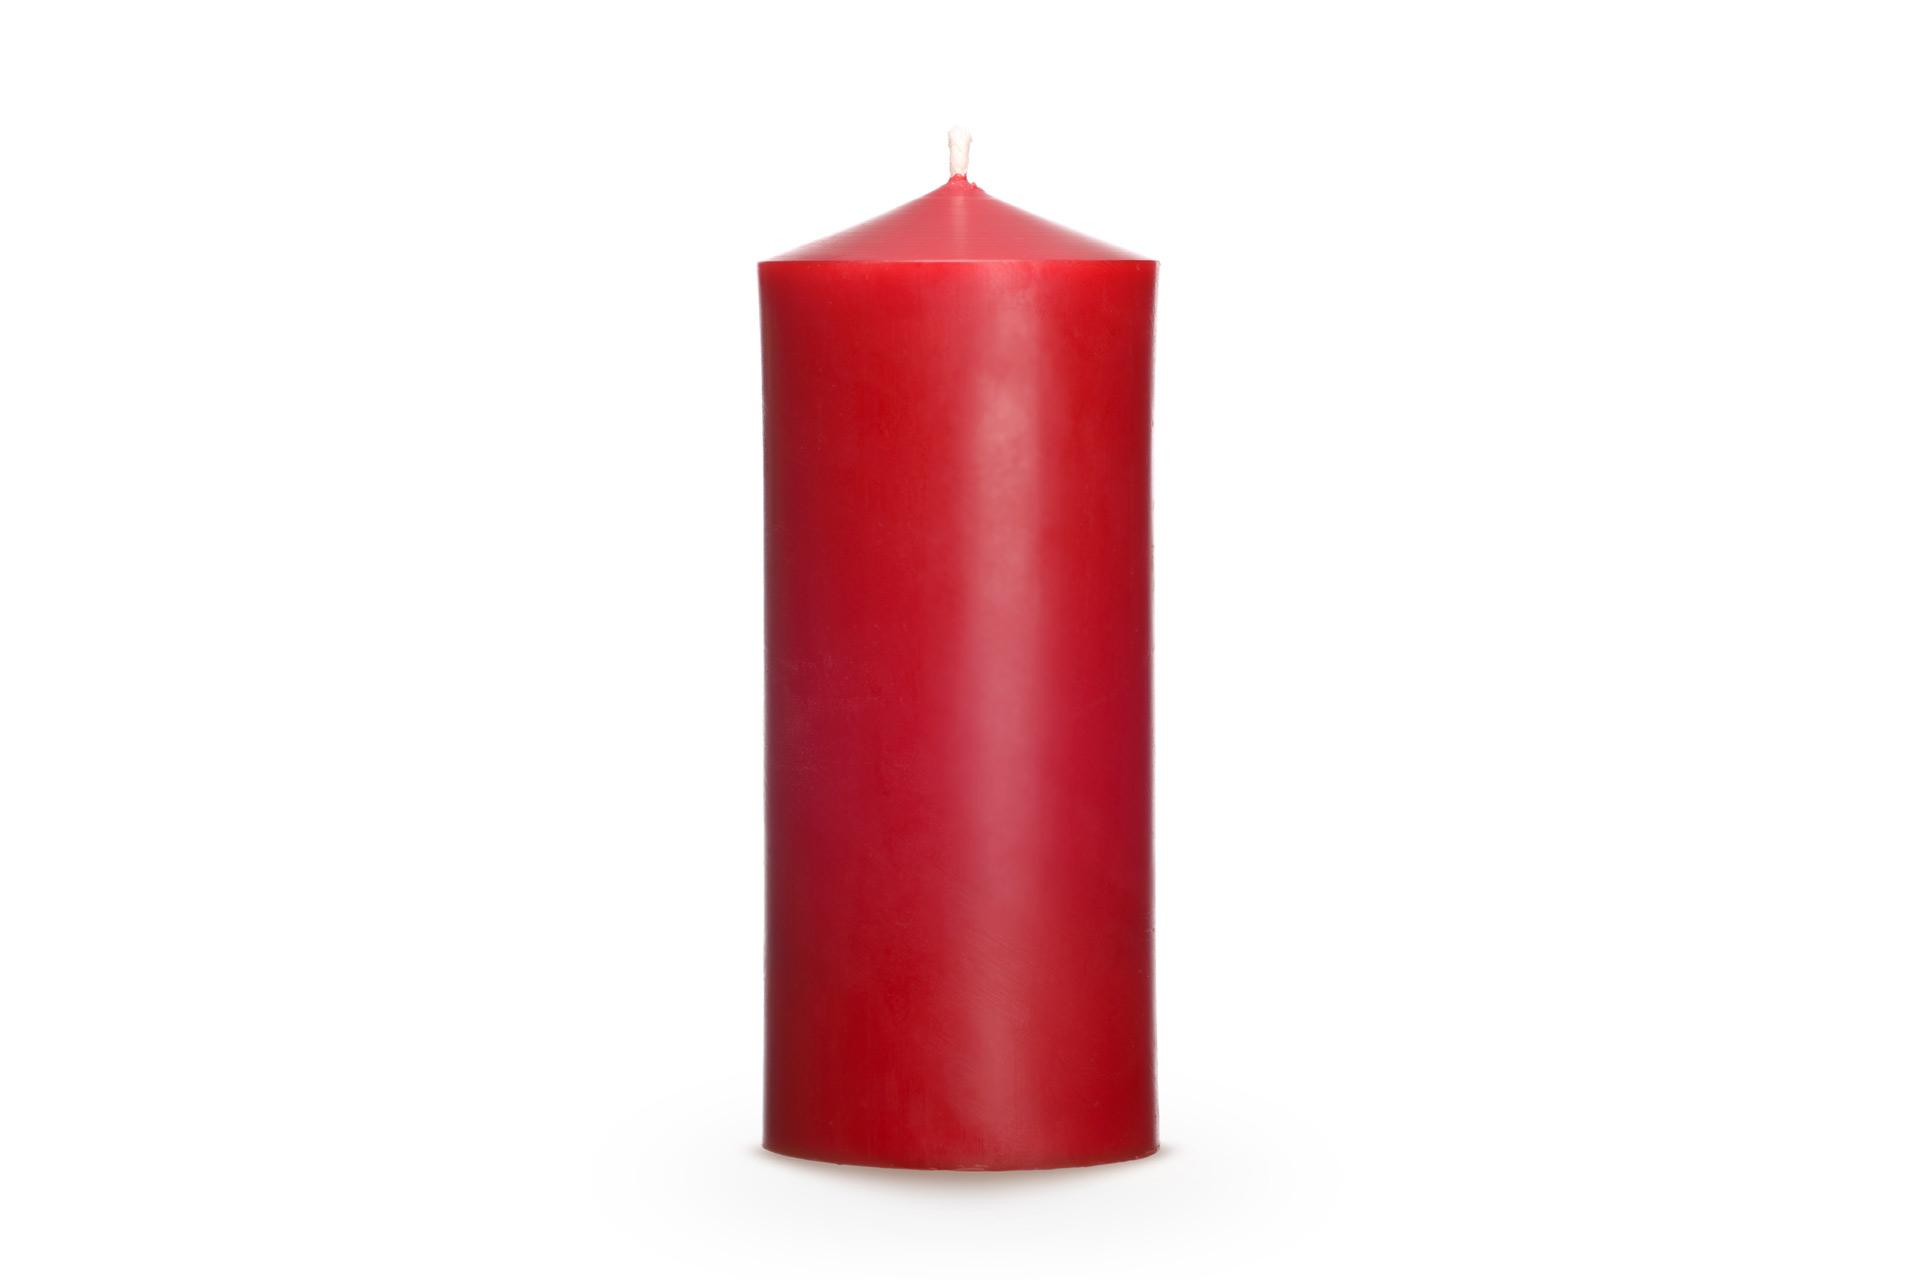 Bienenwachskerzen-Zylindrische-Kerze-Advent-120-rot-unverpackt-ksg